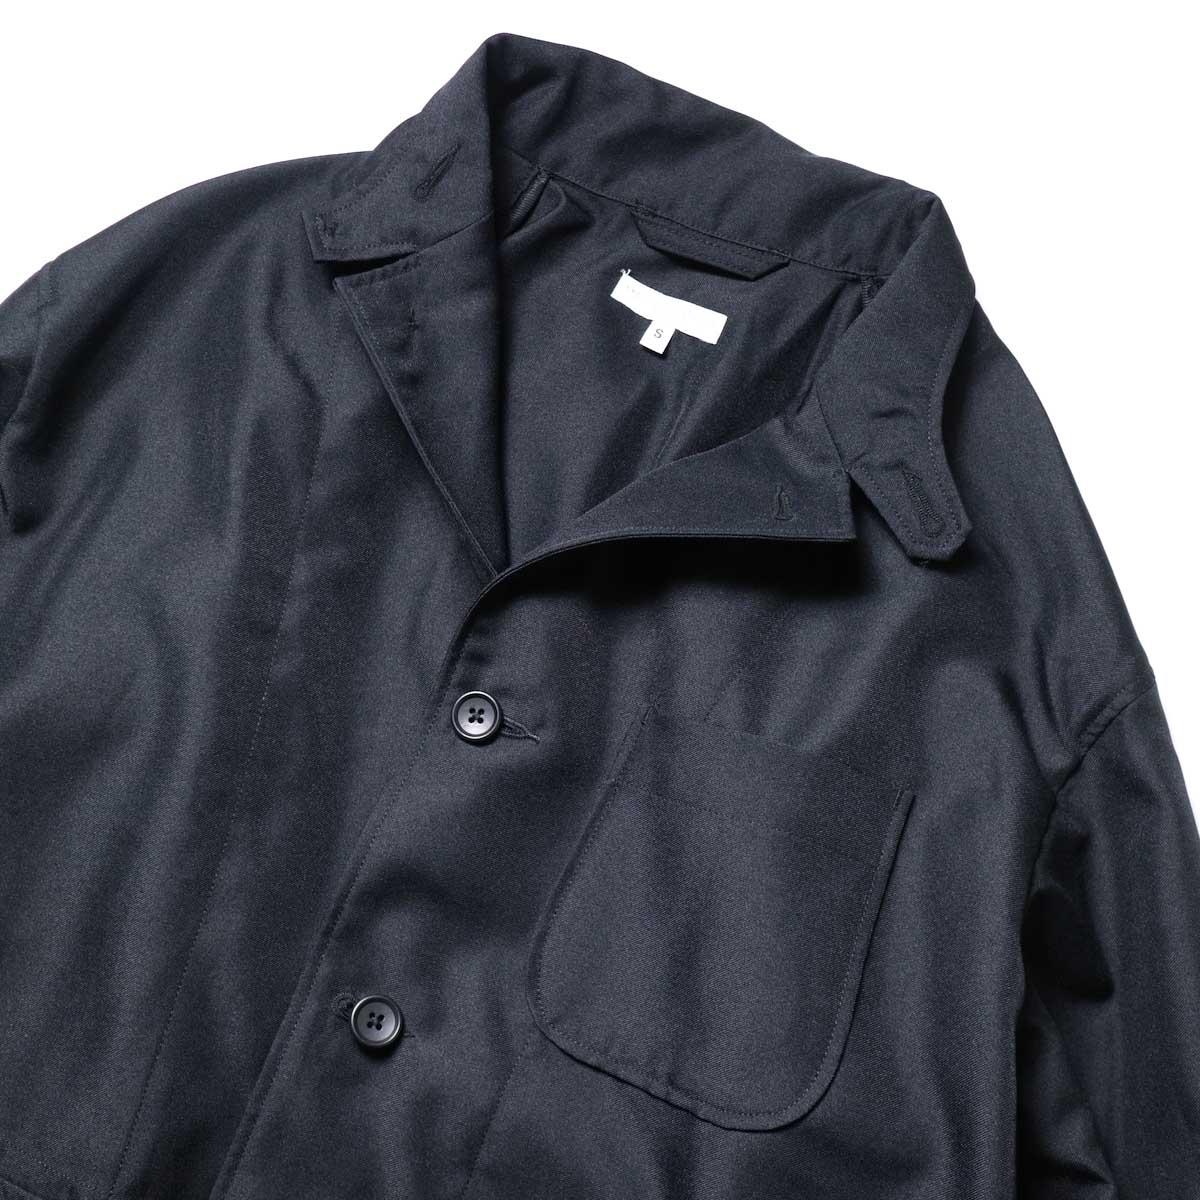 Engineered Garments / Loiter Jacket -Polyester Twill (Black)ラペル